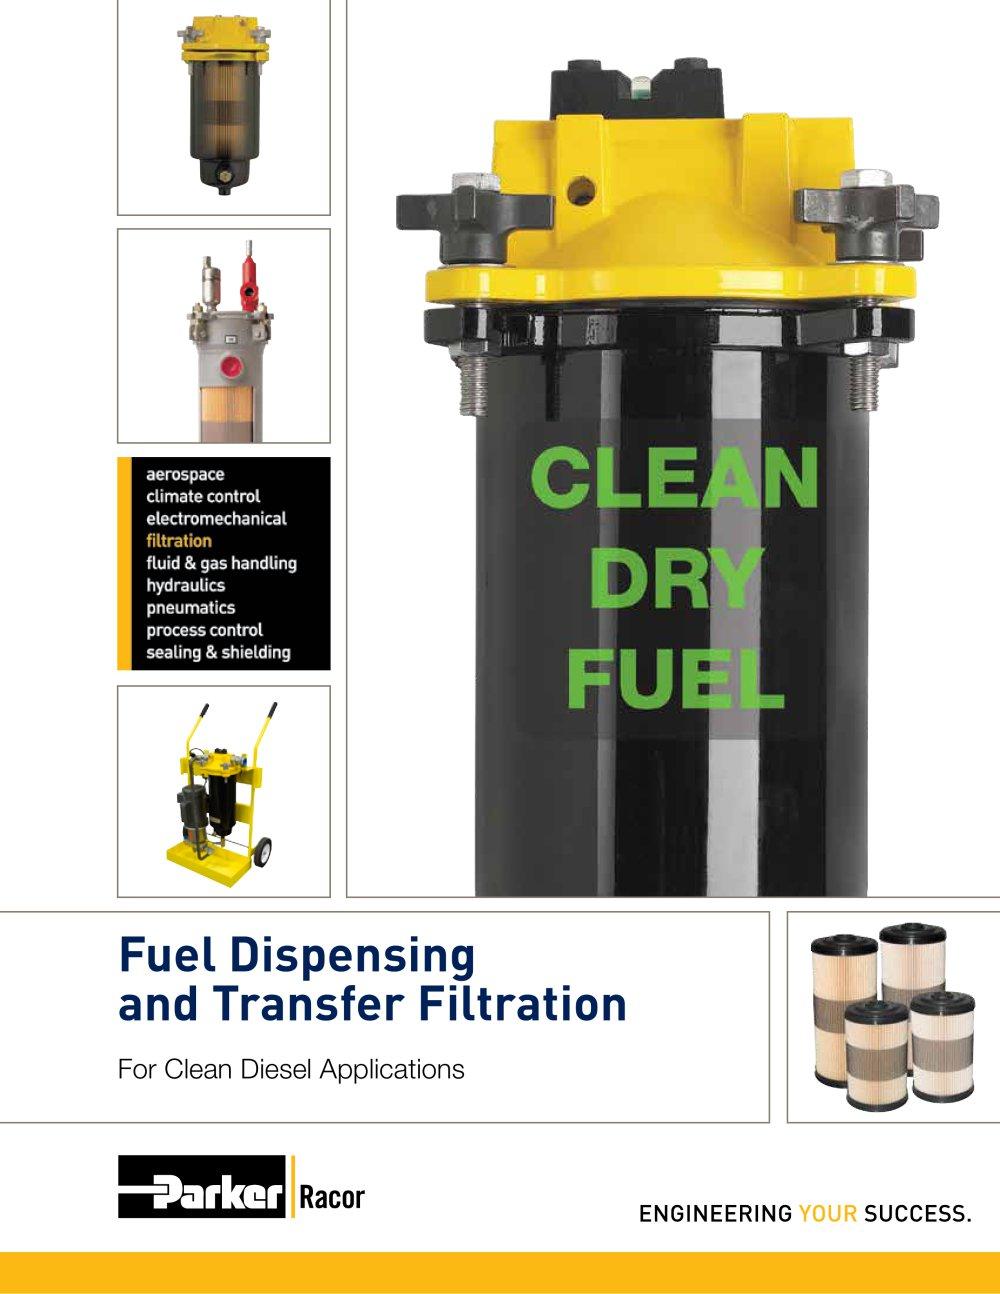 Clean Dry Fuel Parker Hannifin Pdf Catalogues Documentation Filter 1 16 Pages